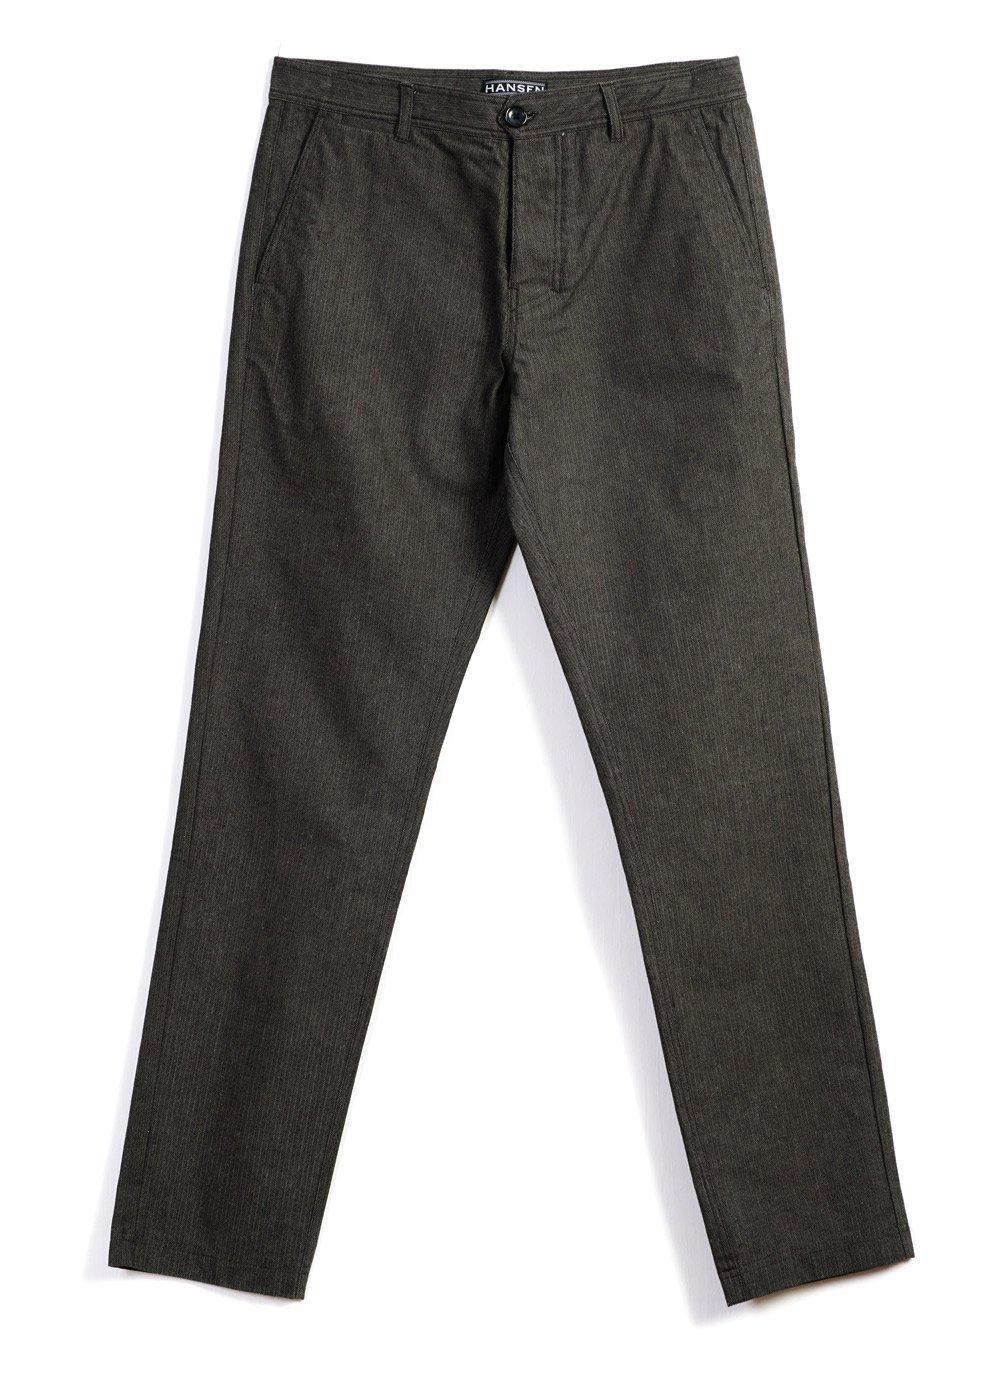 Hansen Garments FRED   Regular Fit Trousers   nut, northsea, woods